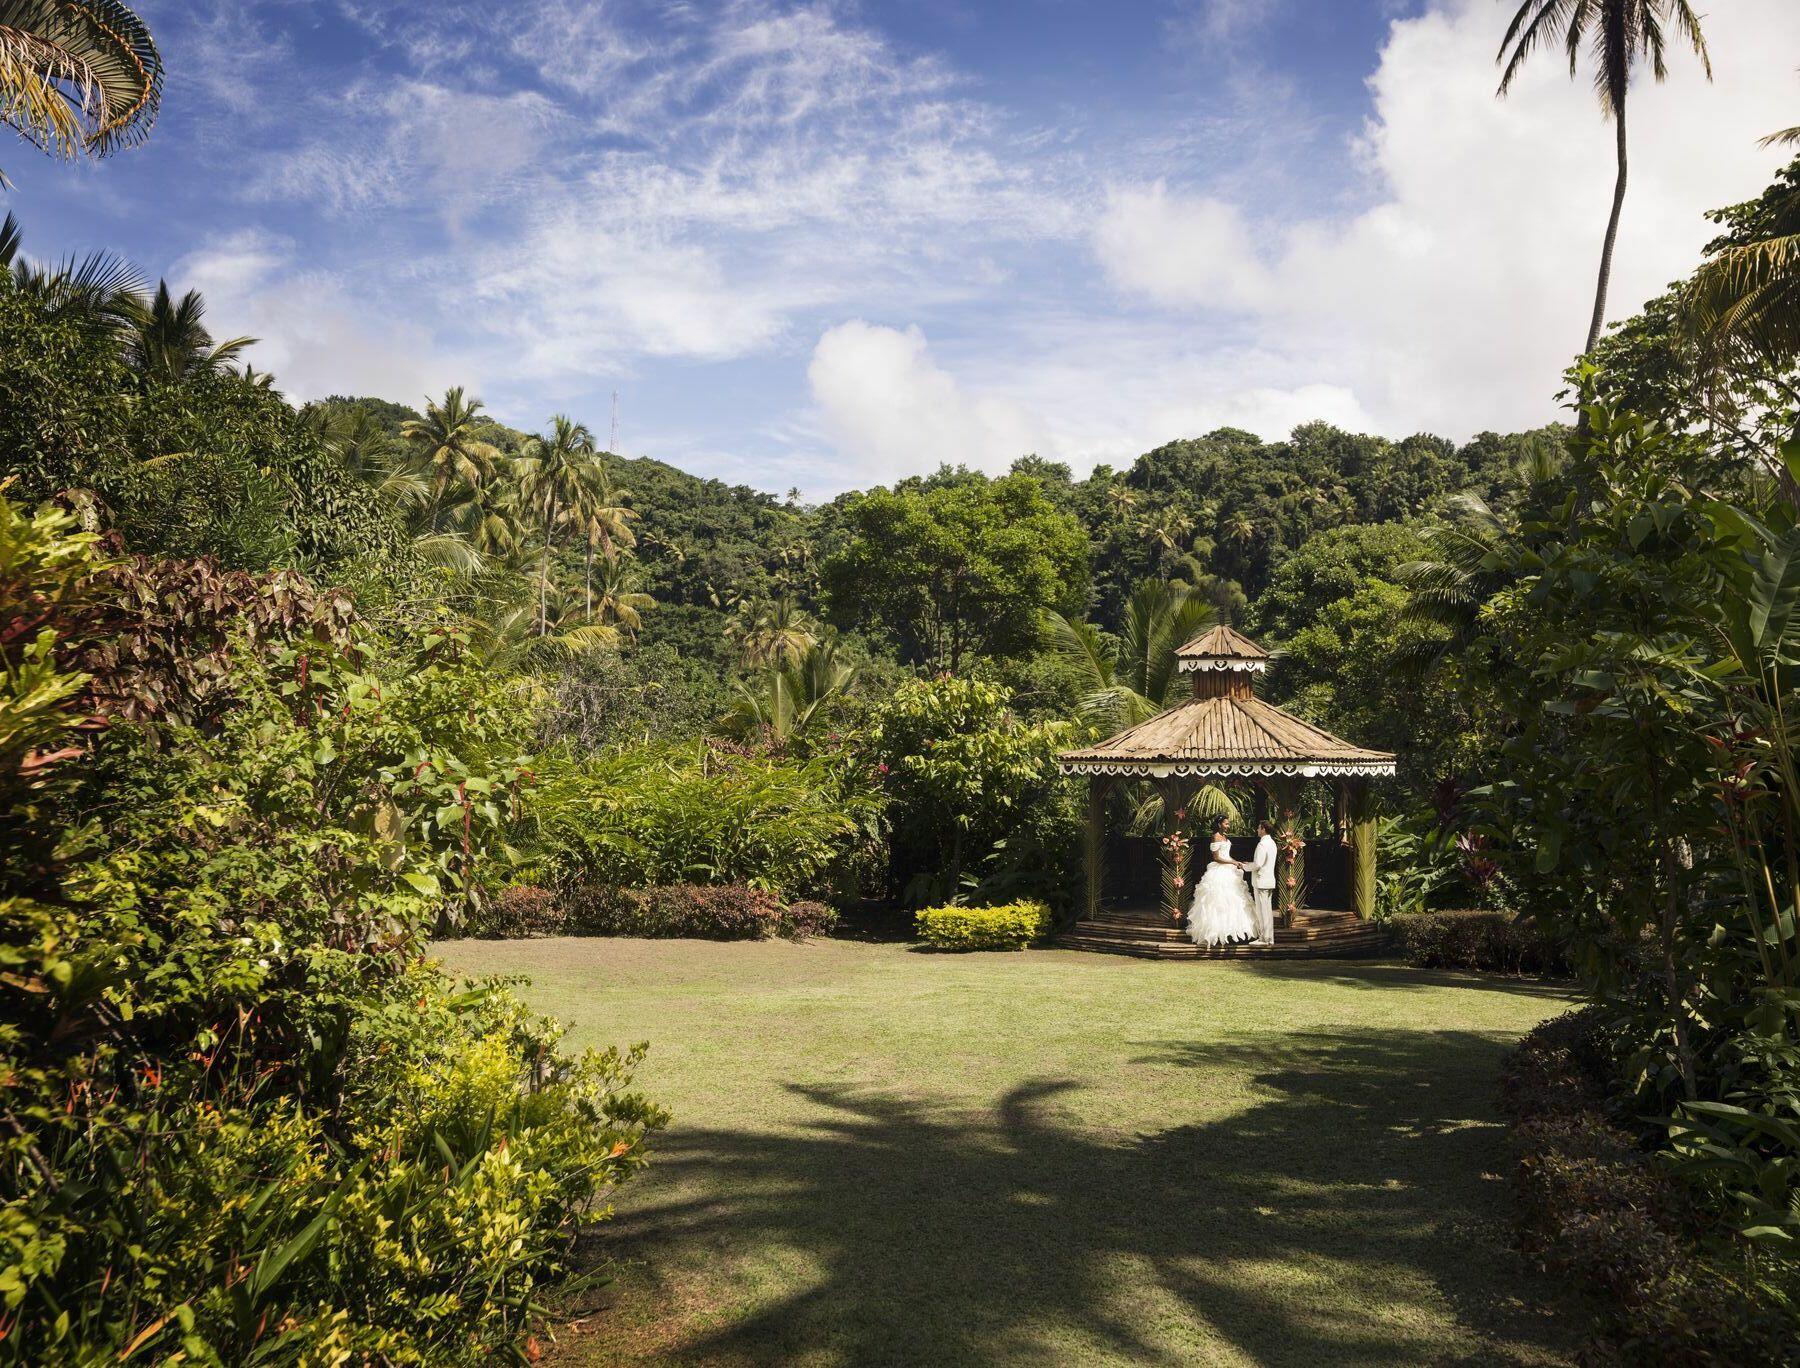 wedding gazebo in tropical setting